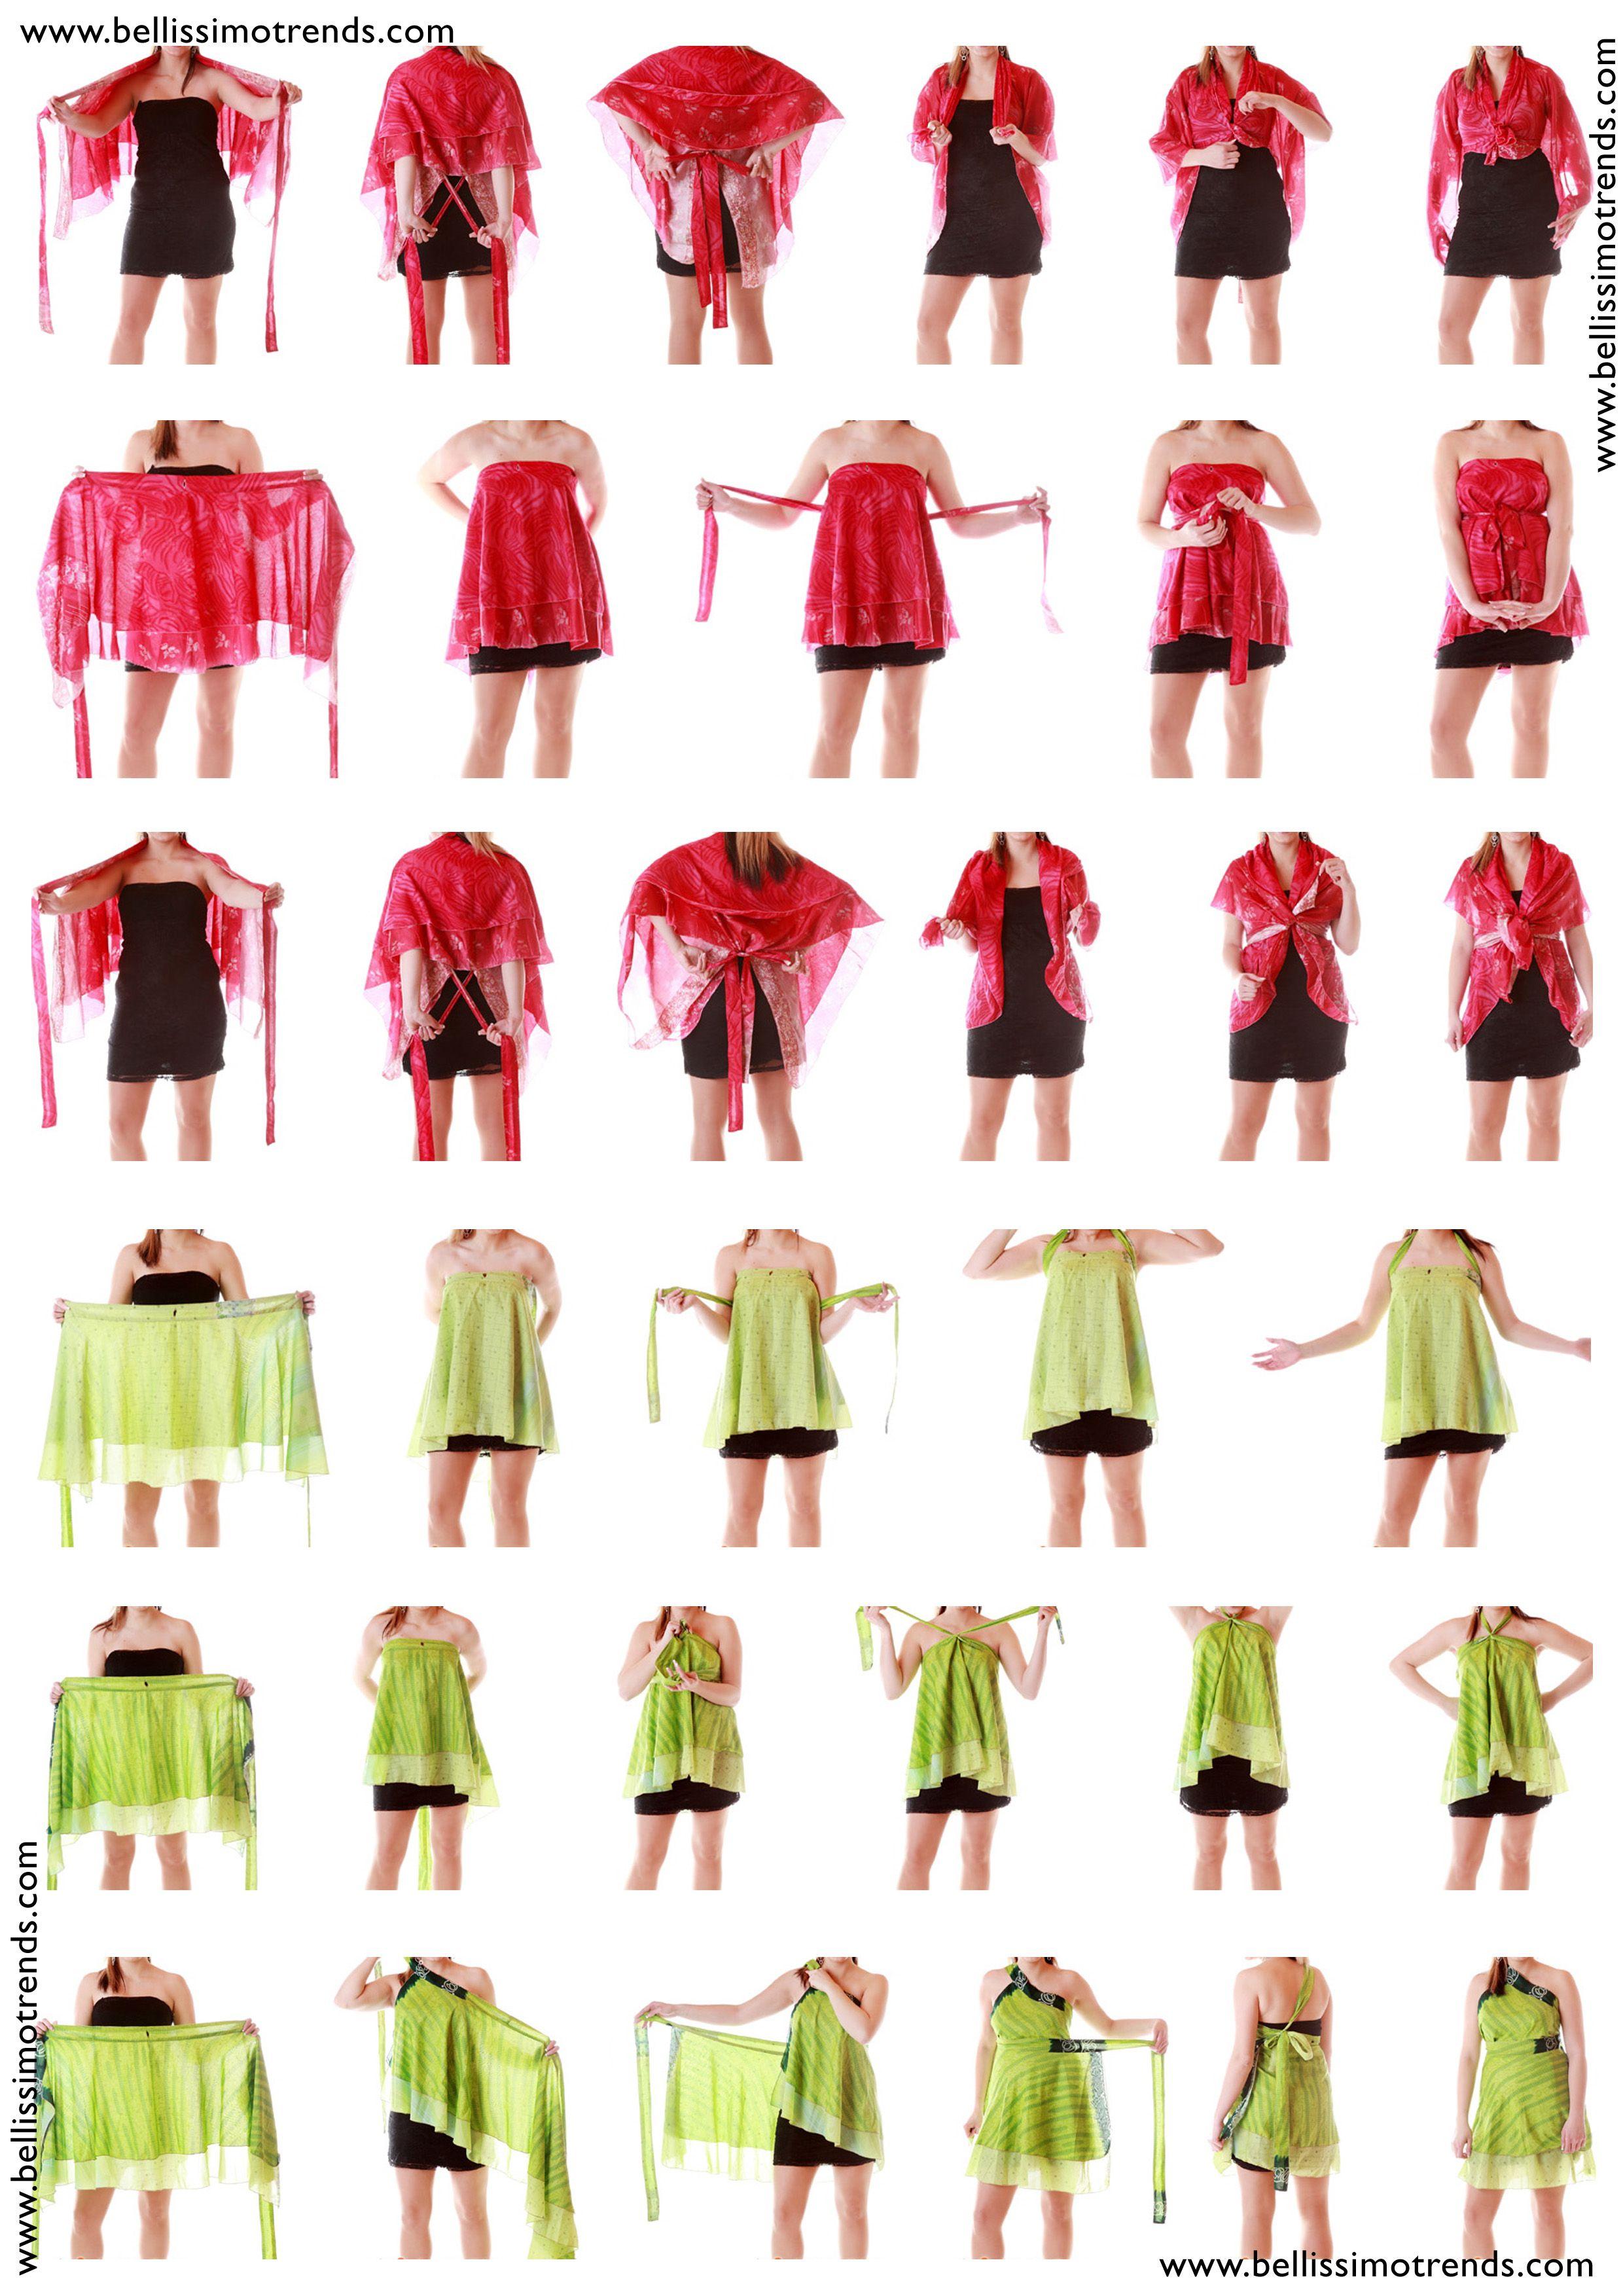 Pareos falda transformables multiusos | Saris, Patchwork and Wraps